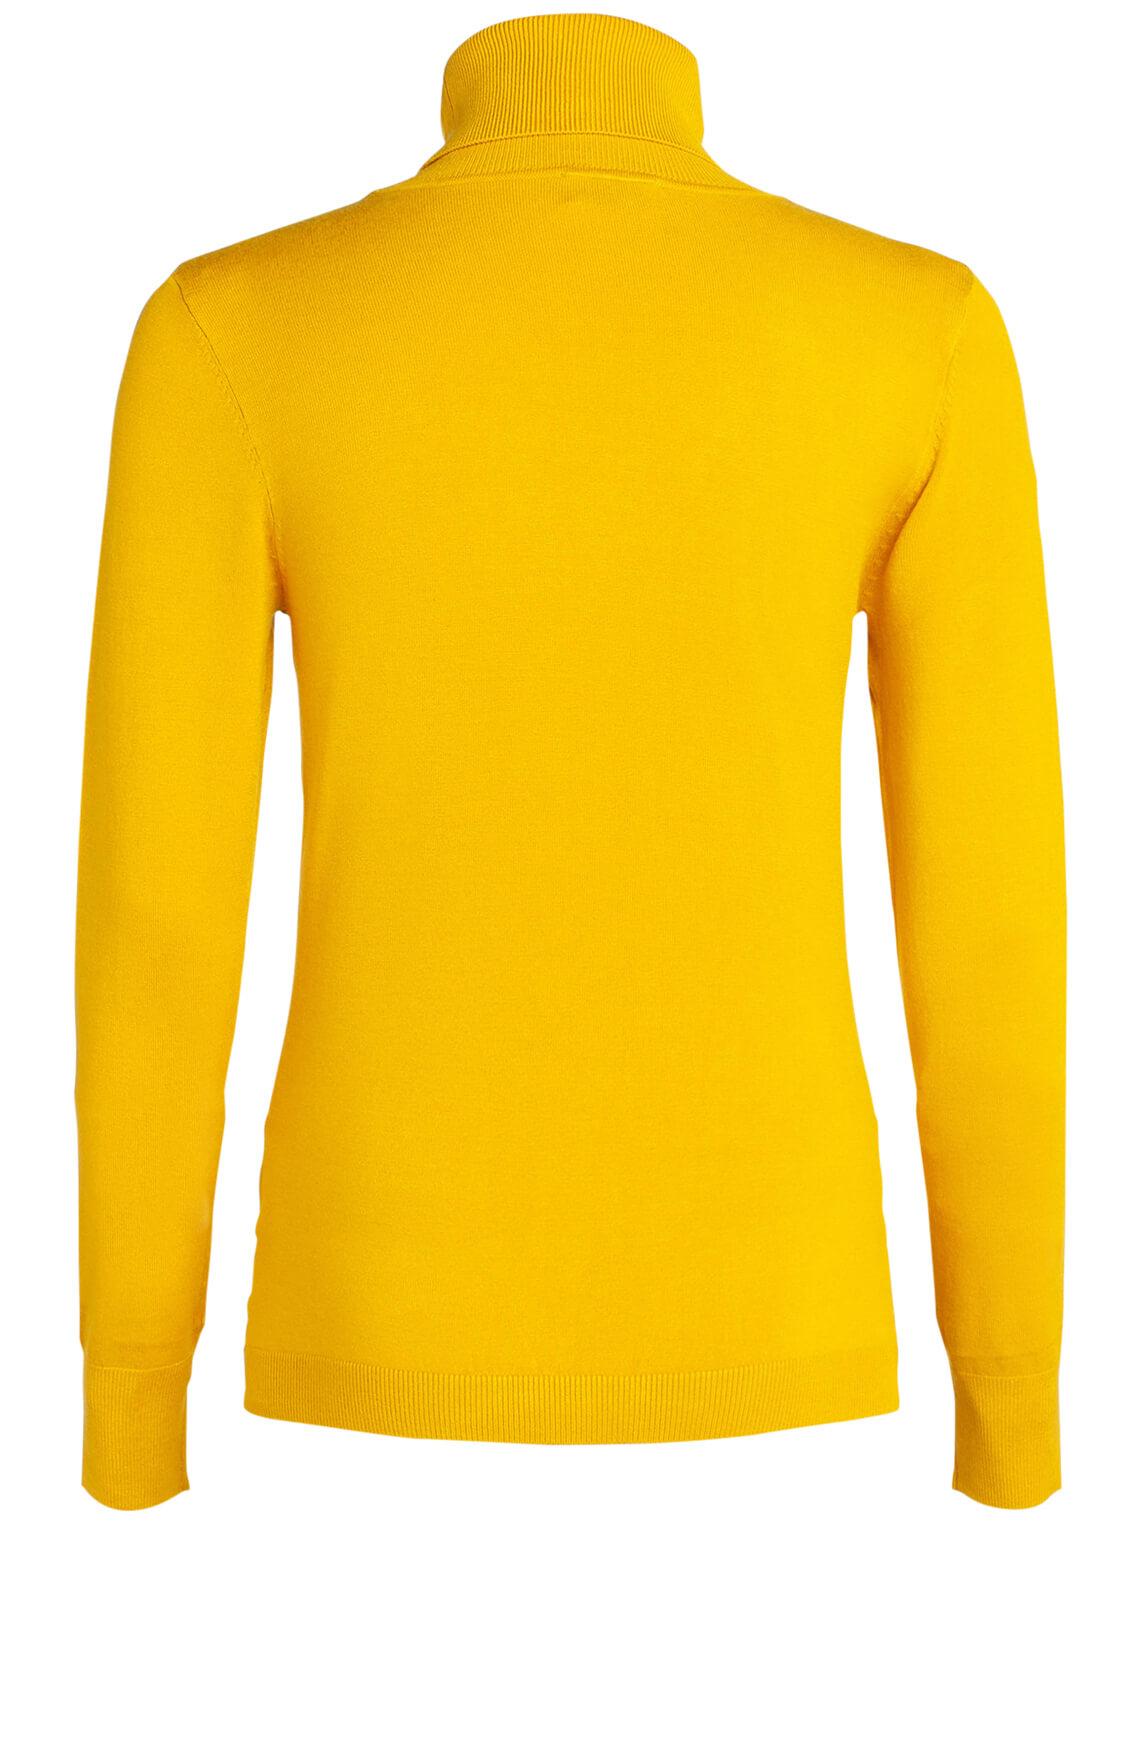 Anna Dames Pullover met col geel